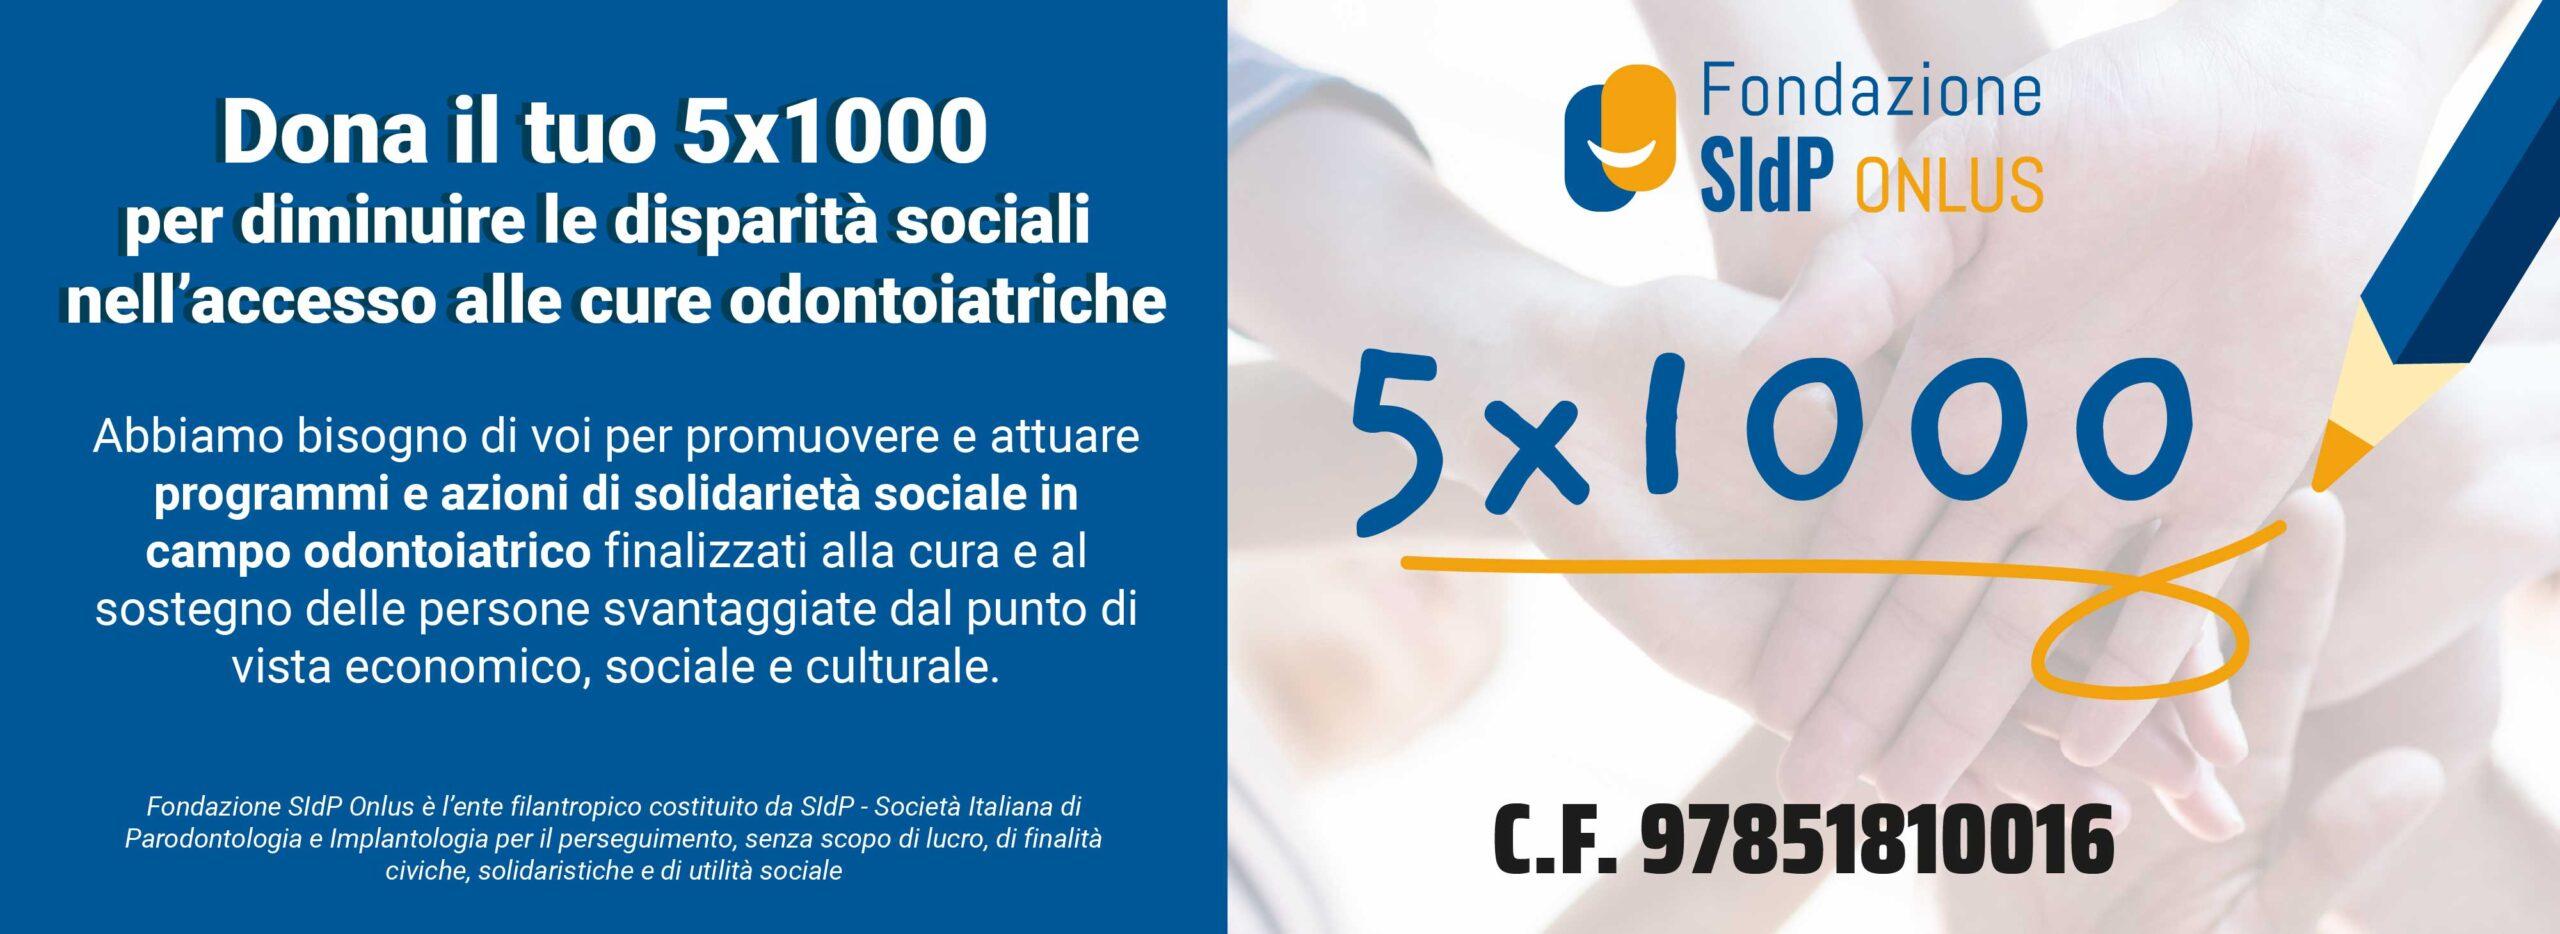 5x1000 Fondazione SIdP ONLUS